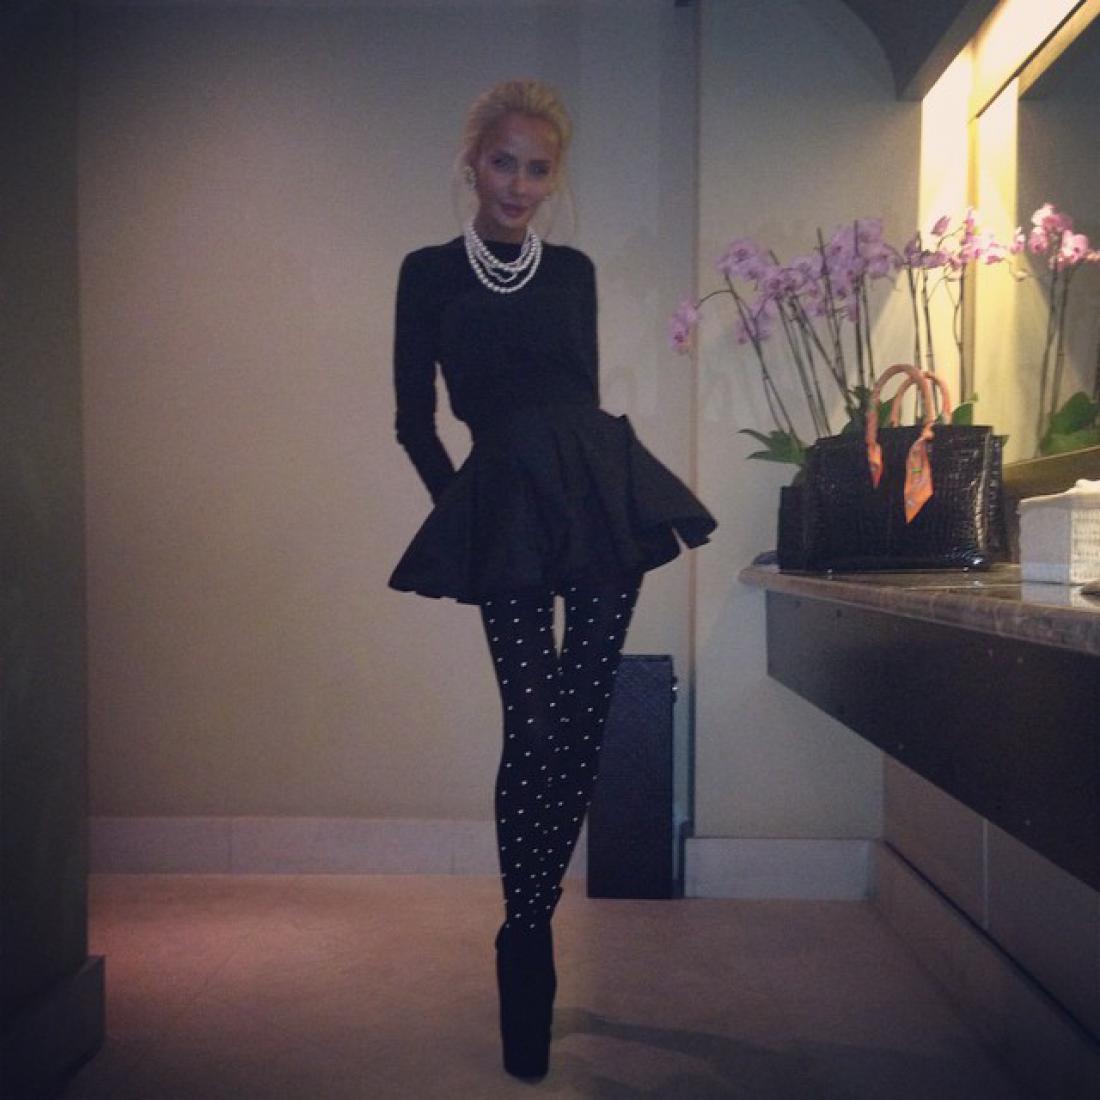 Русская жена британского олигарха Кристина Сысоева ходит по бутикам в бикини